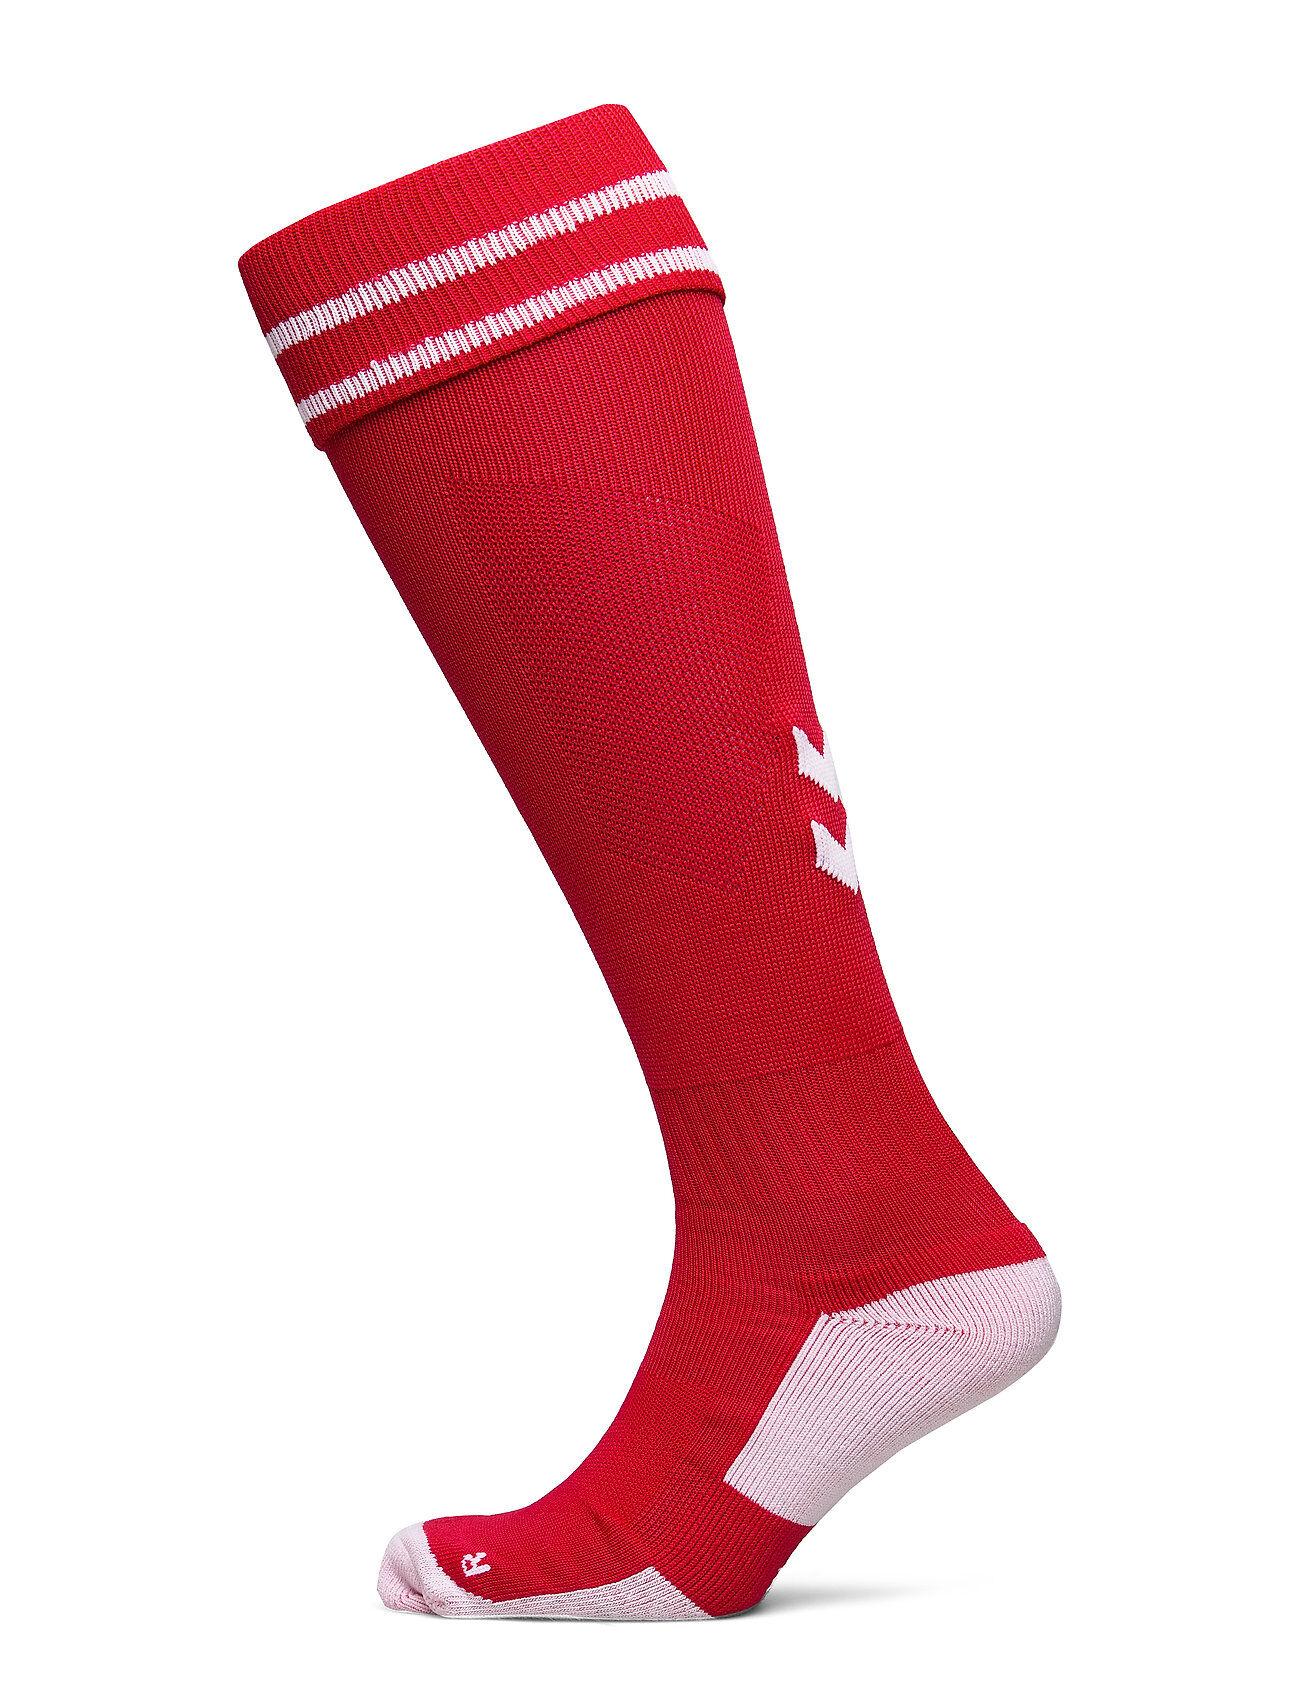 Hummel Element Football Sock Underwear Socks Football Socks Rød Hummel